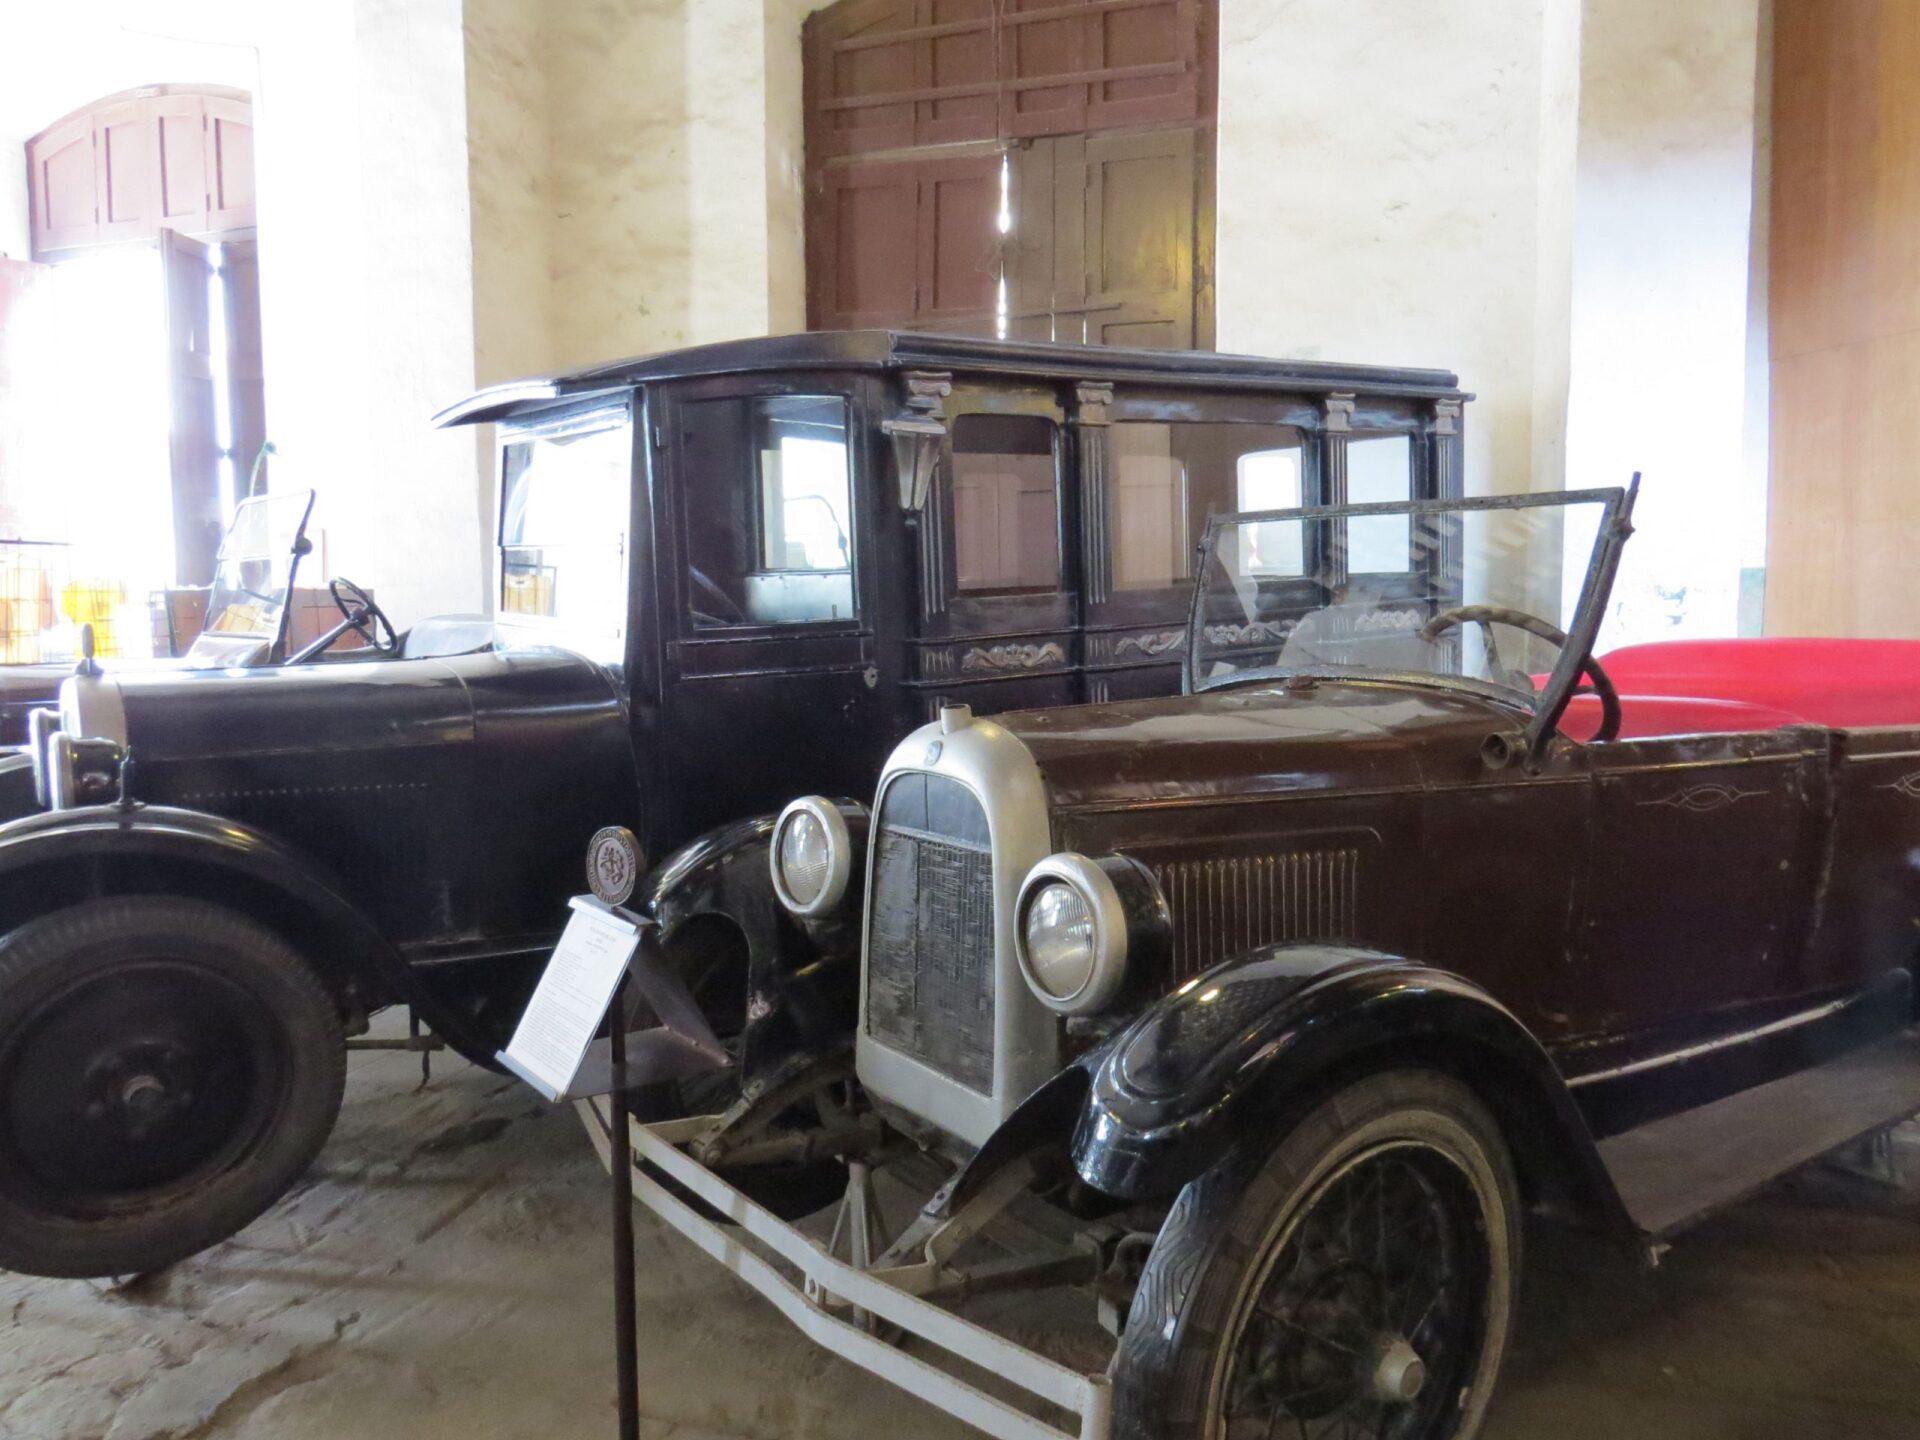 Музей старых машинок вГаване